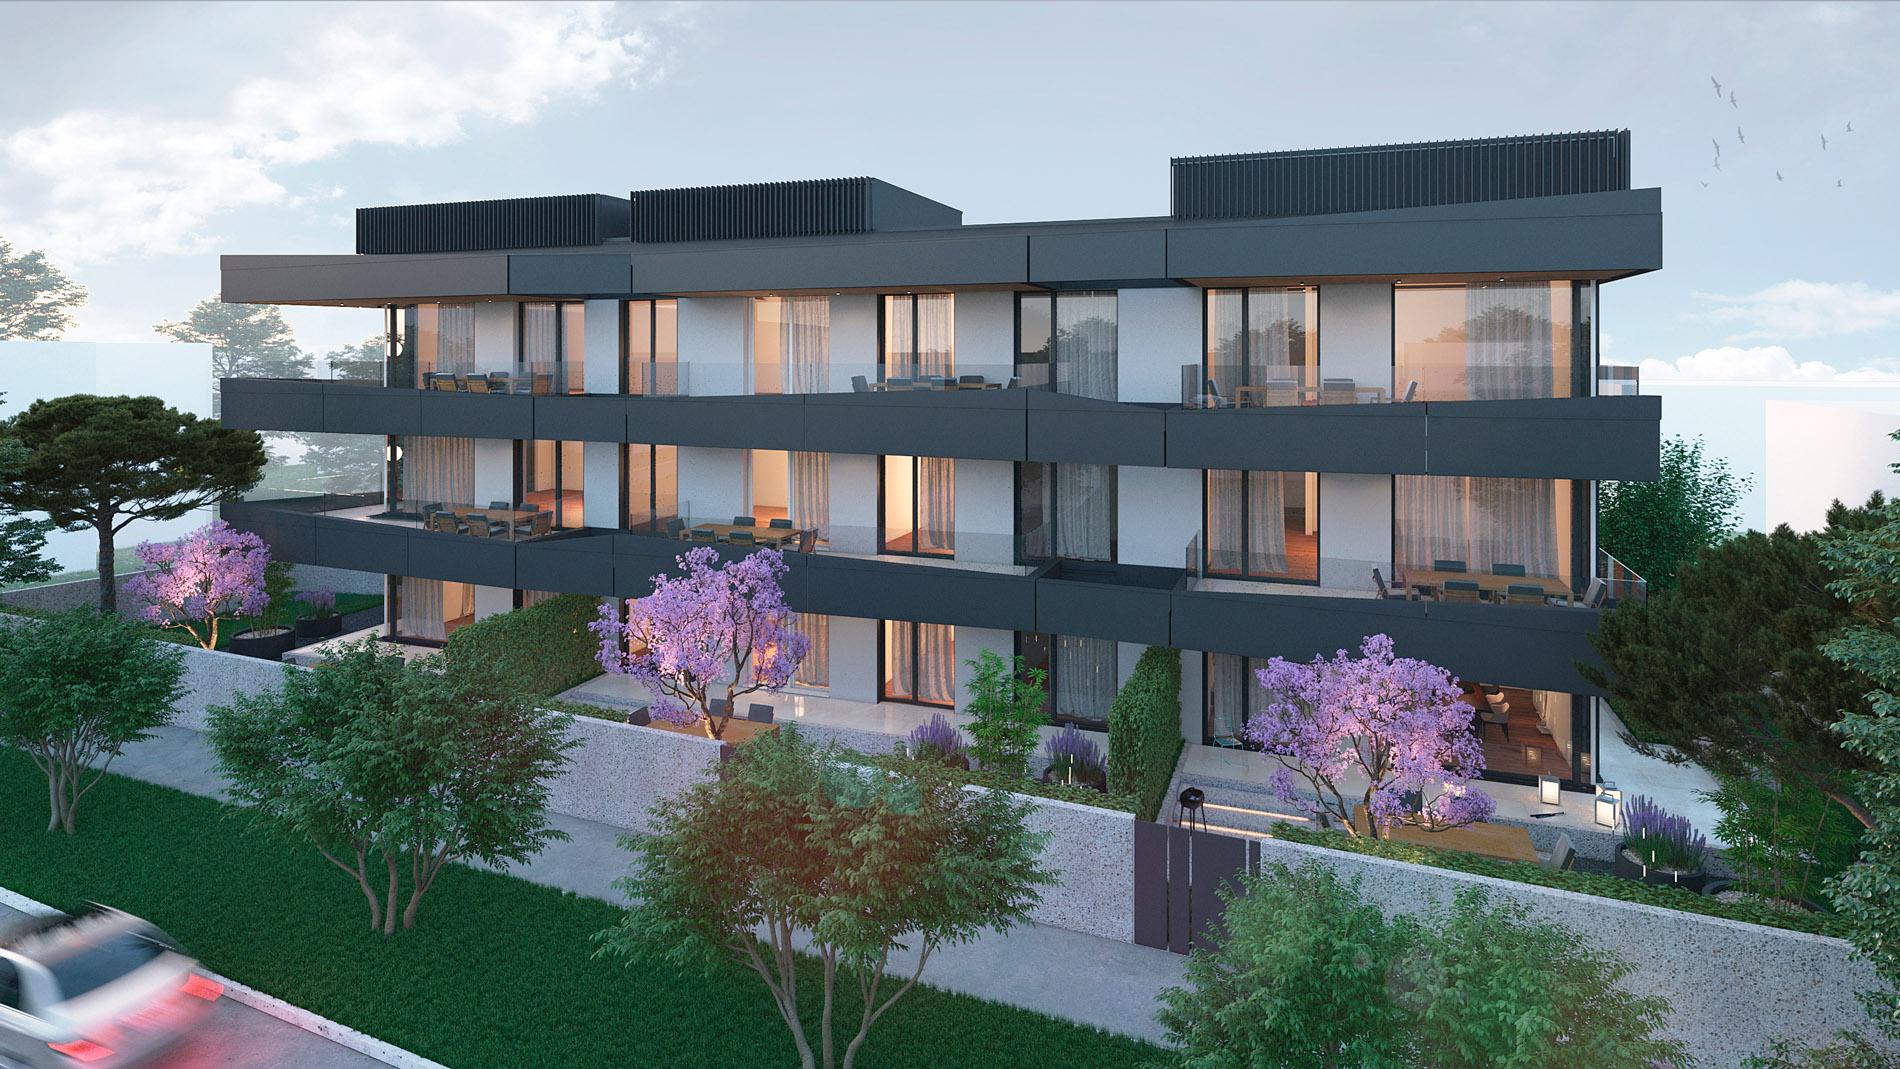 Novogradnja Vila blok 9-ka 1